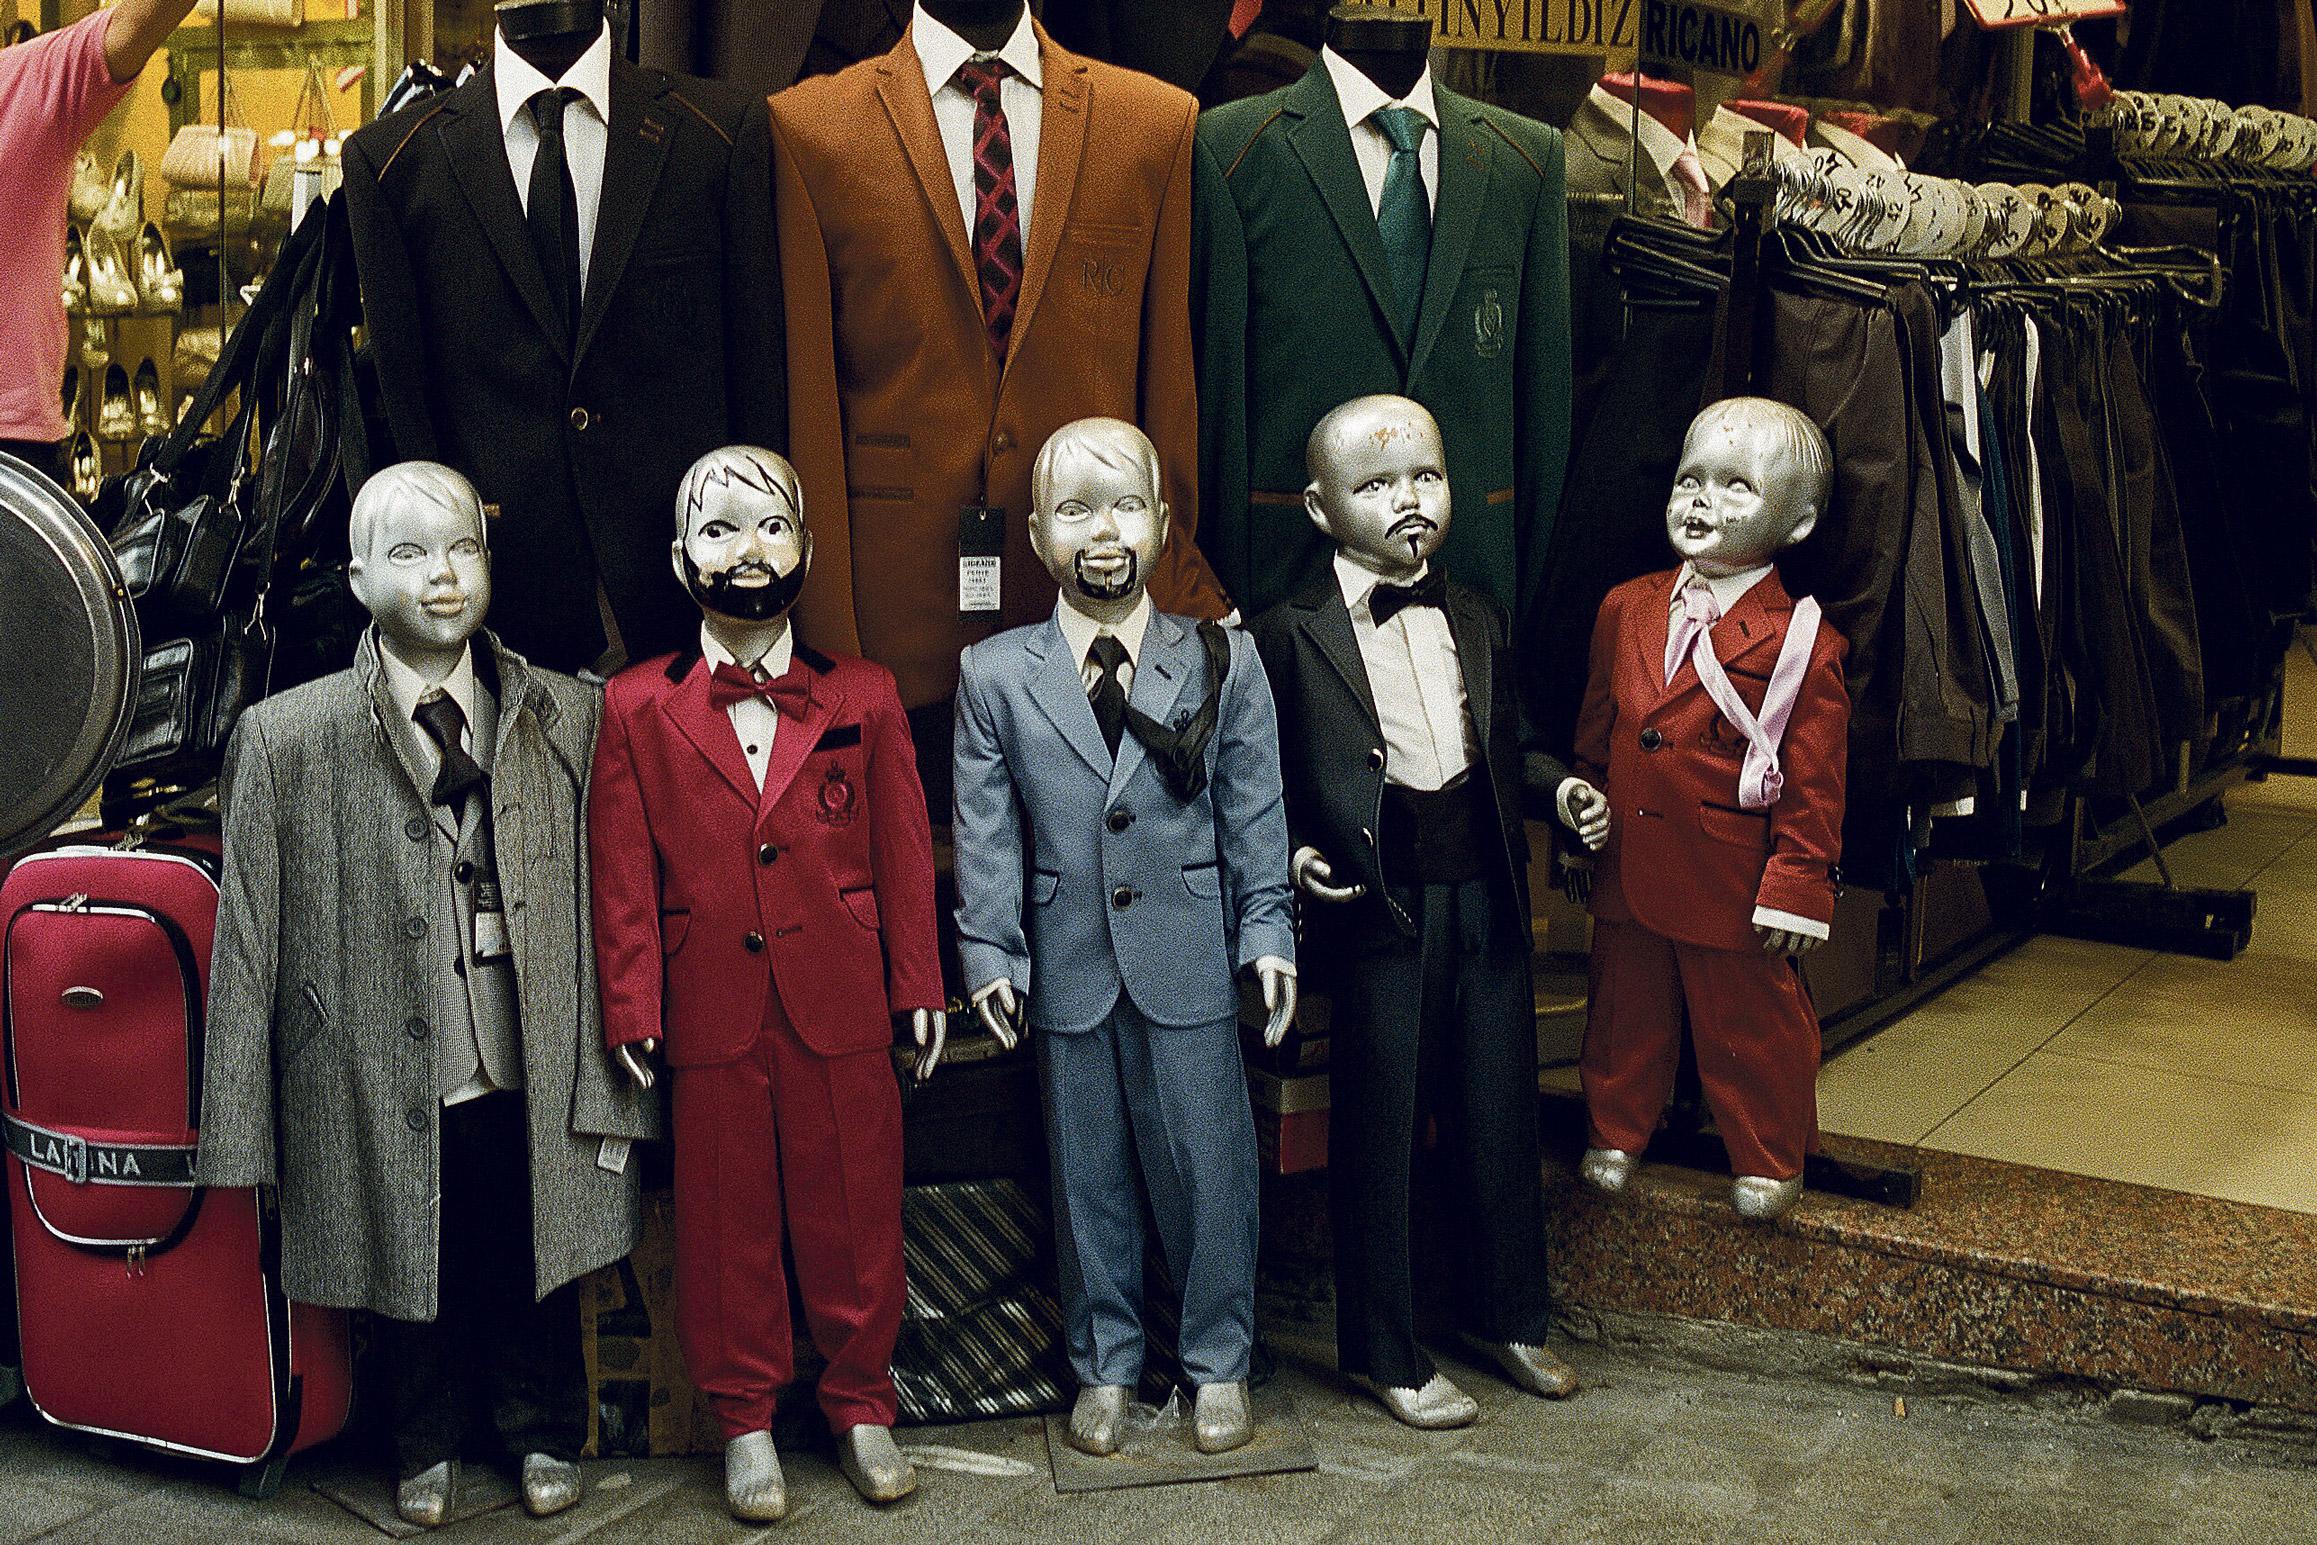 Istanbul, Politik, Puppen